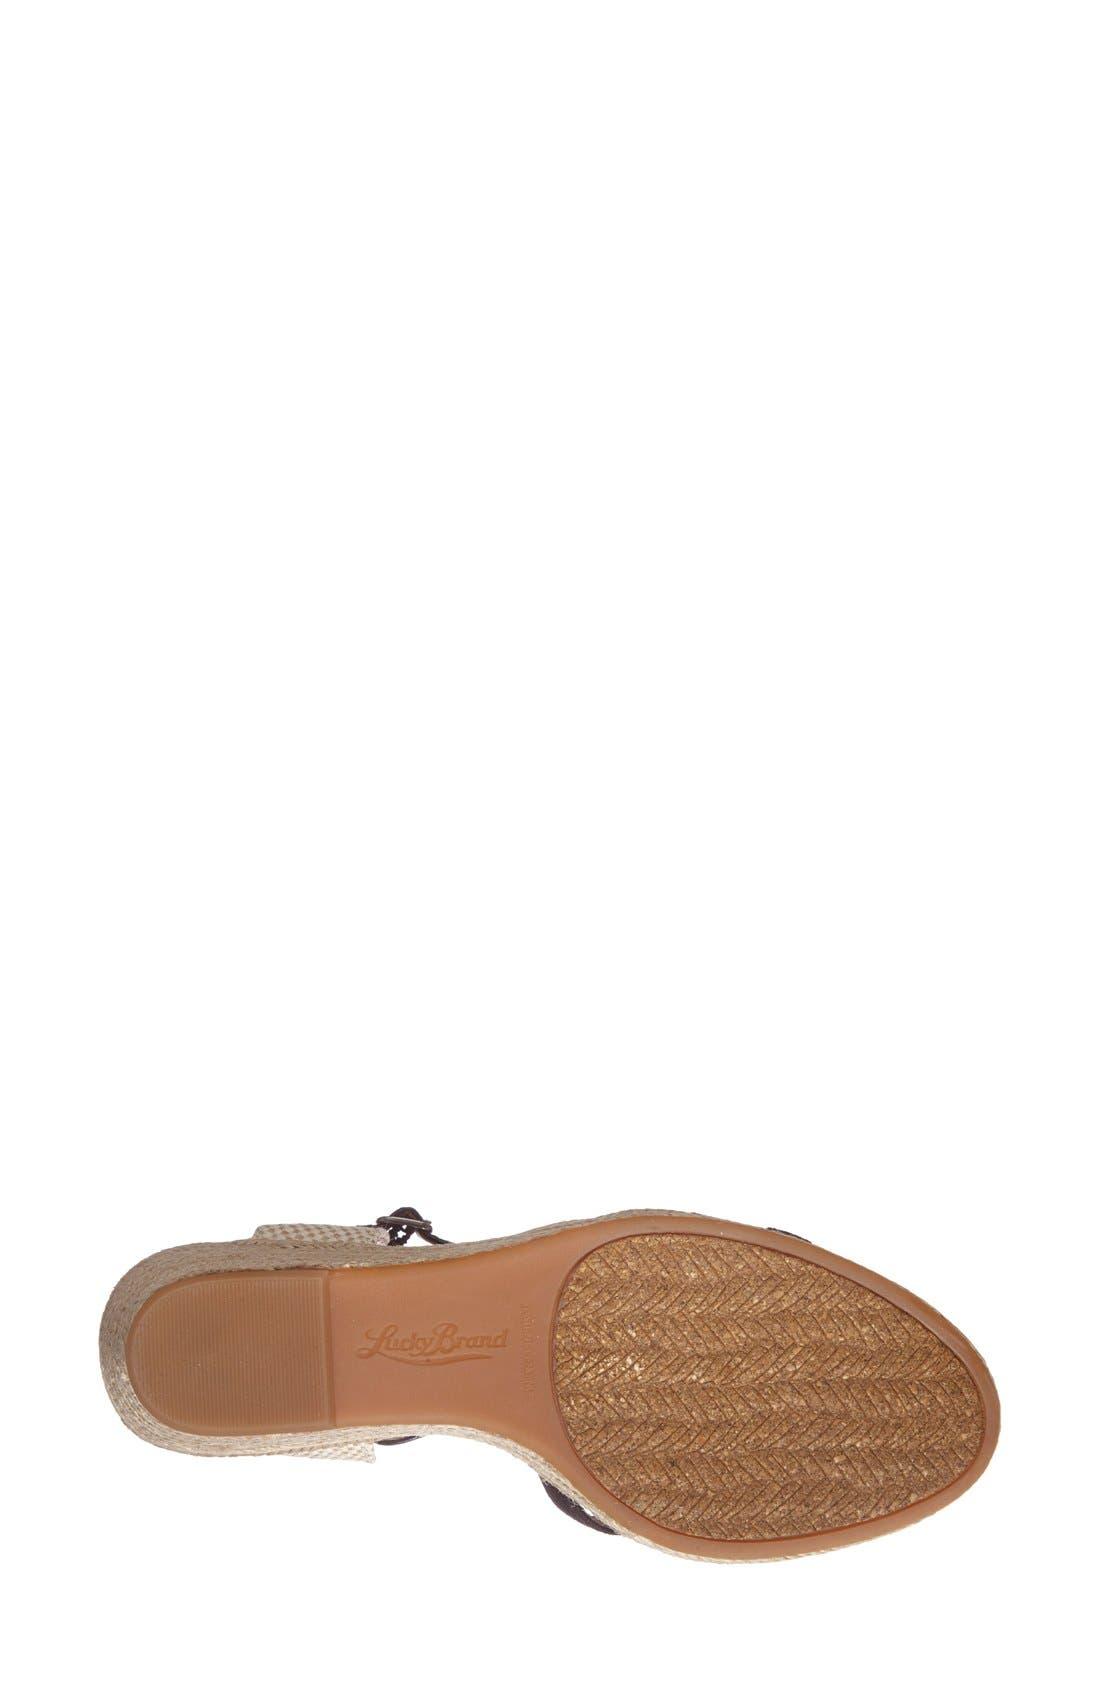 'Kalessie' Espadrille Wedge Sandal,                             Alternate thumbnail 4, color,                             001